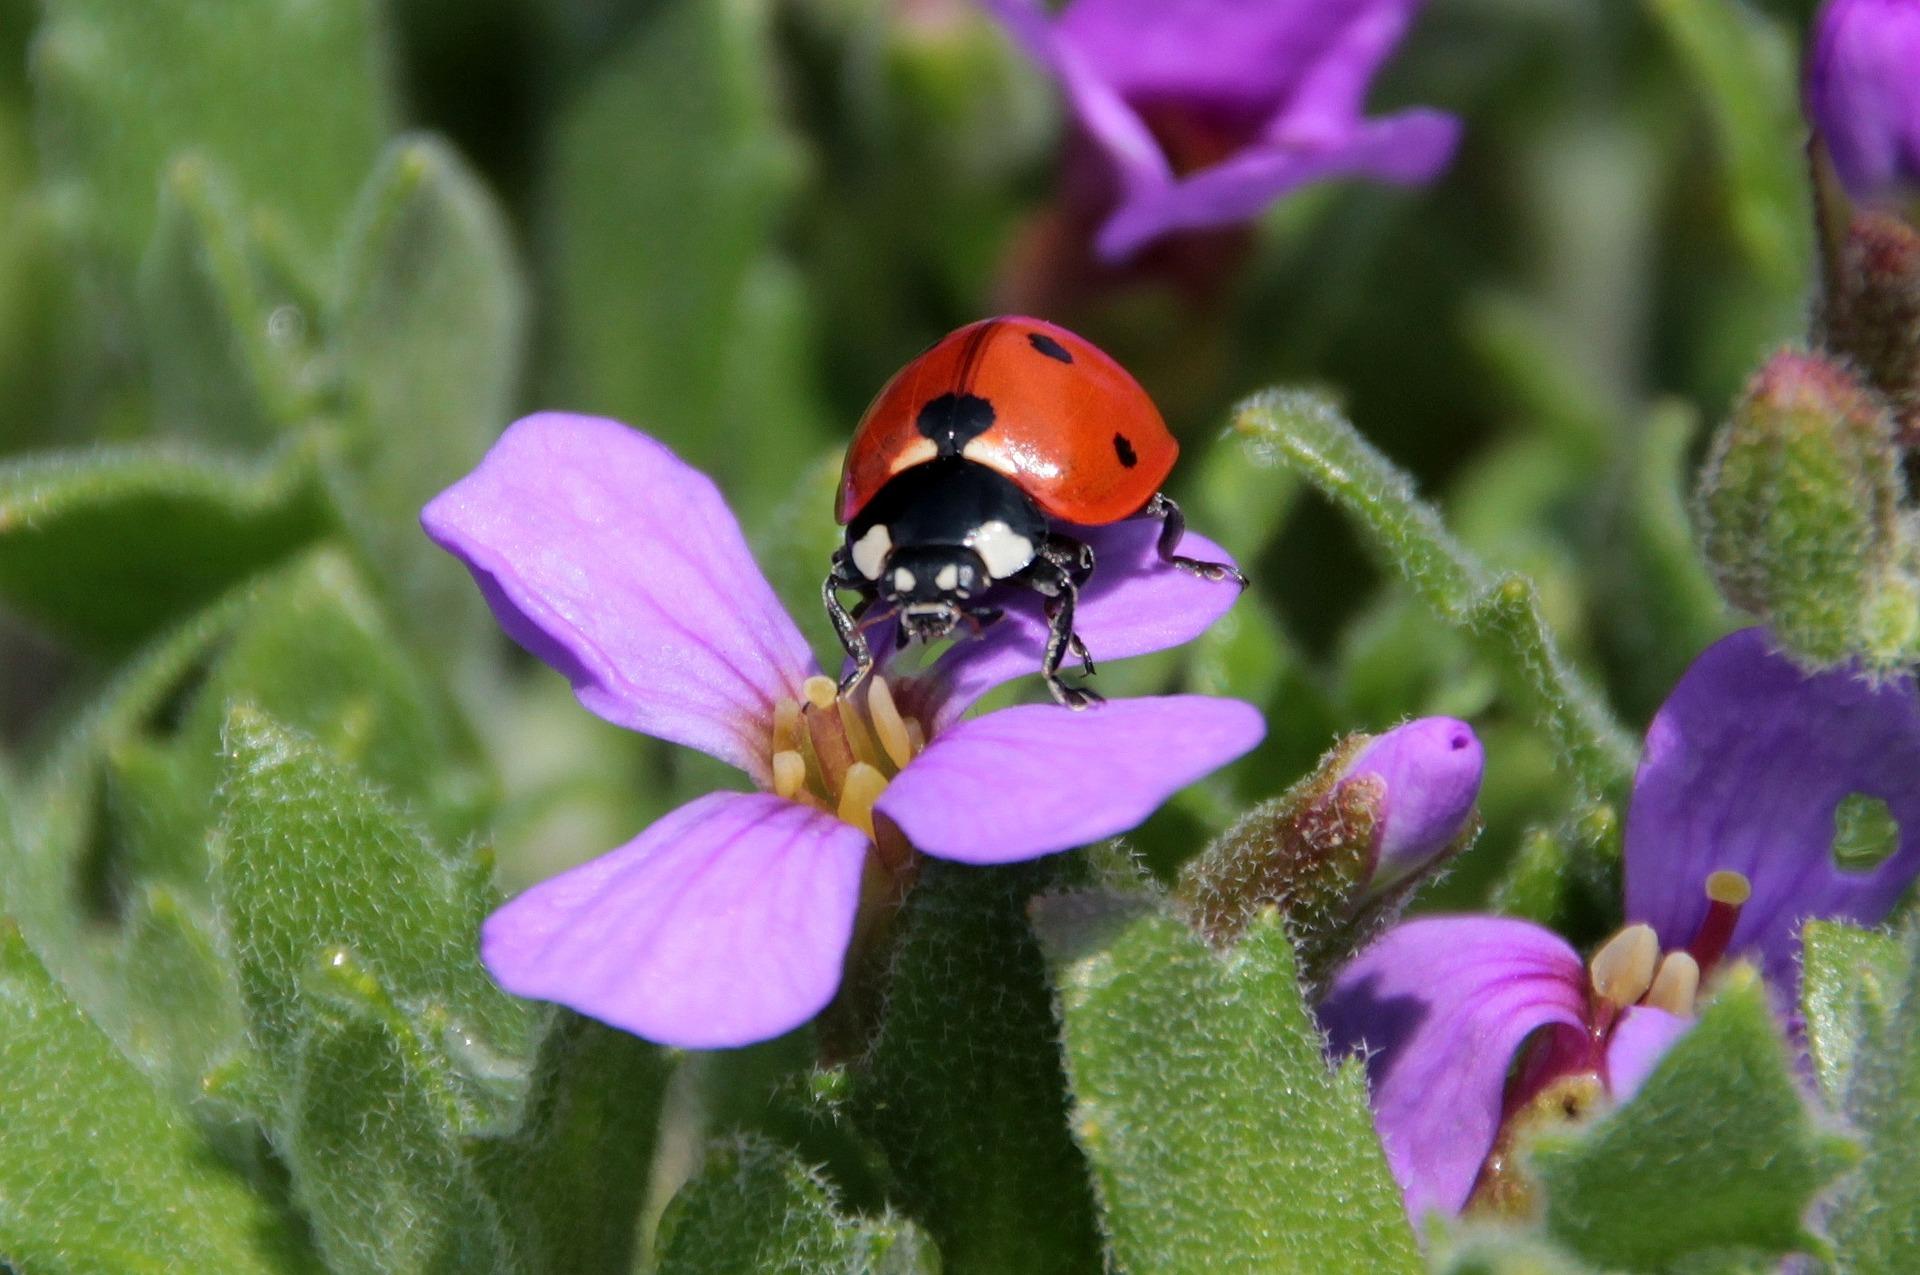 ladybug-1328828_1920